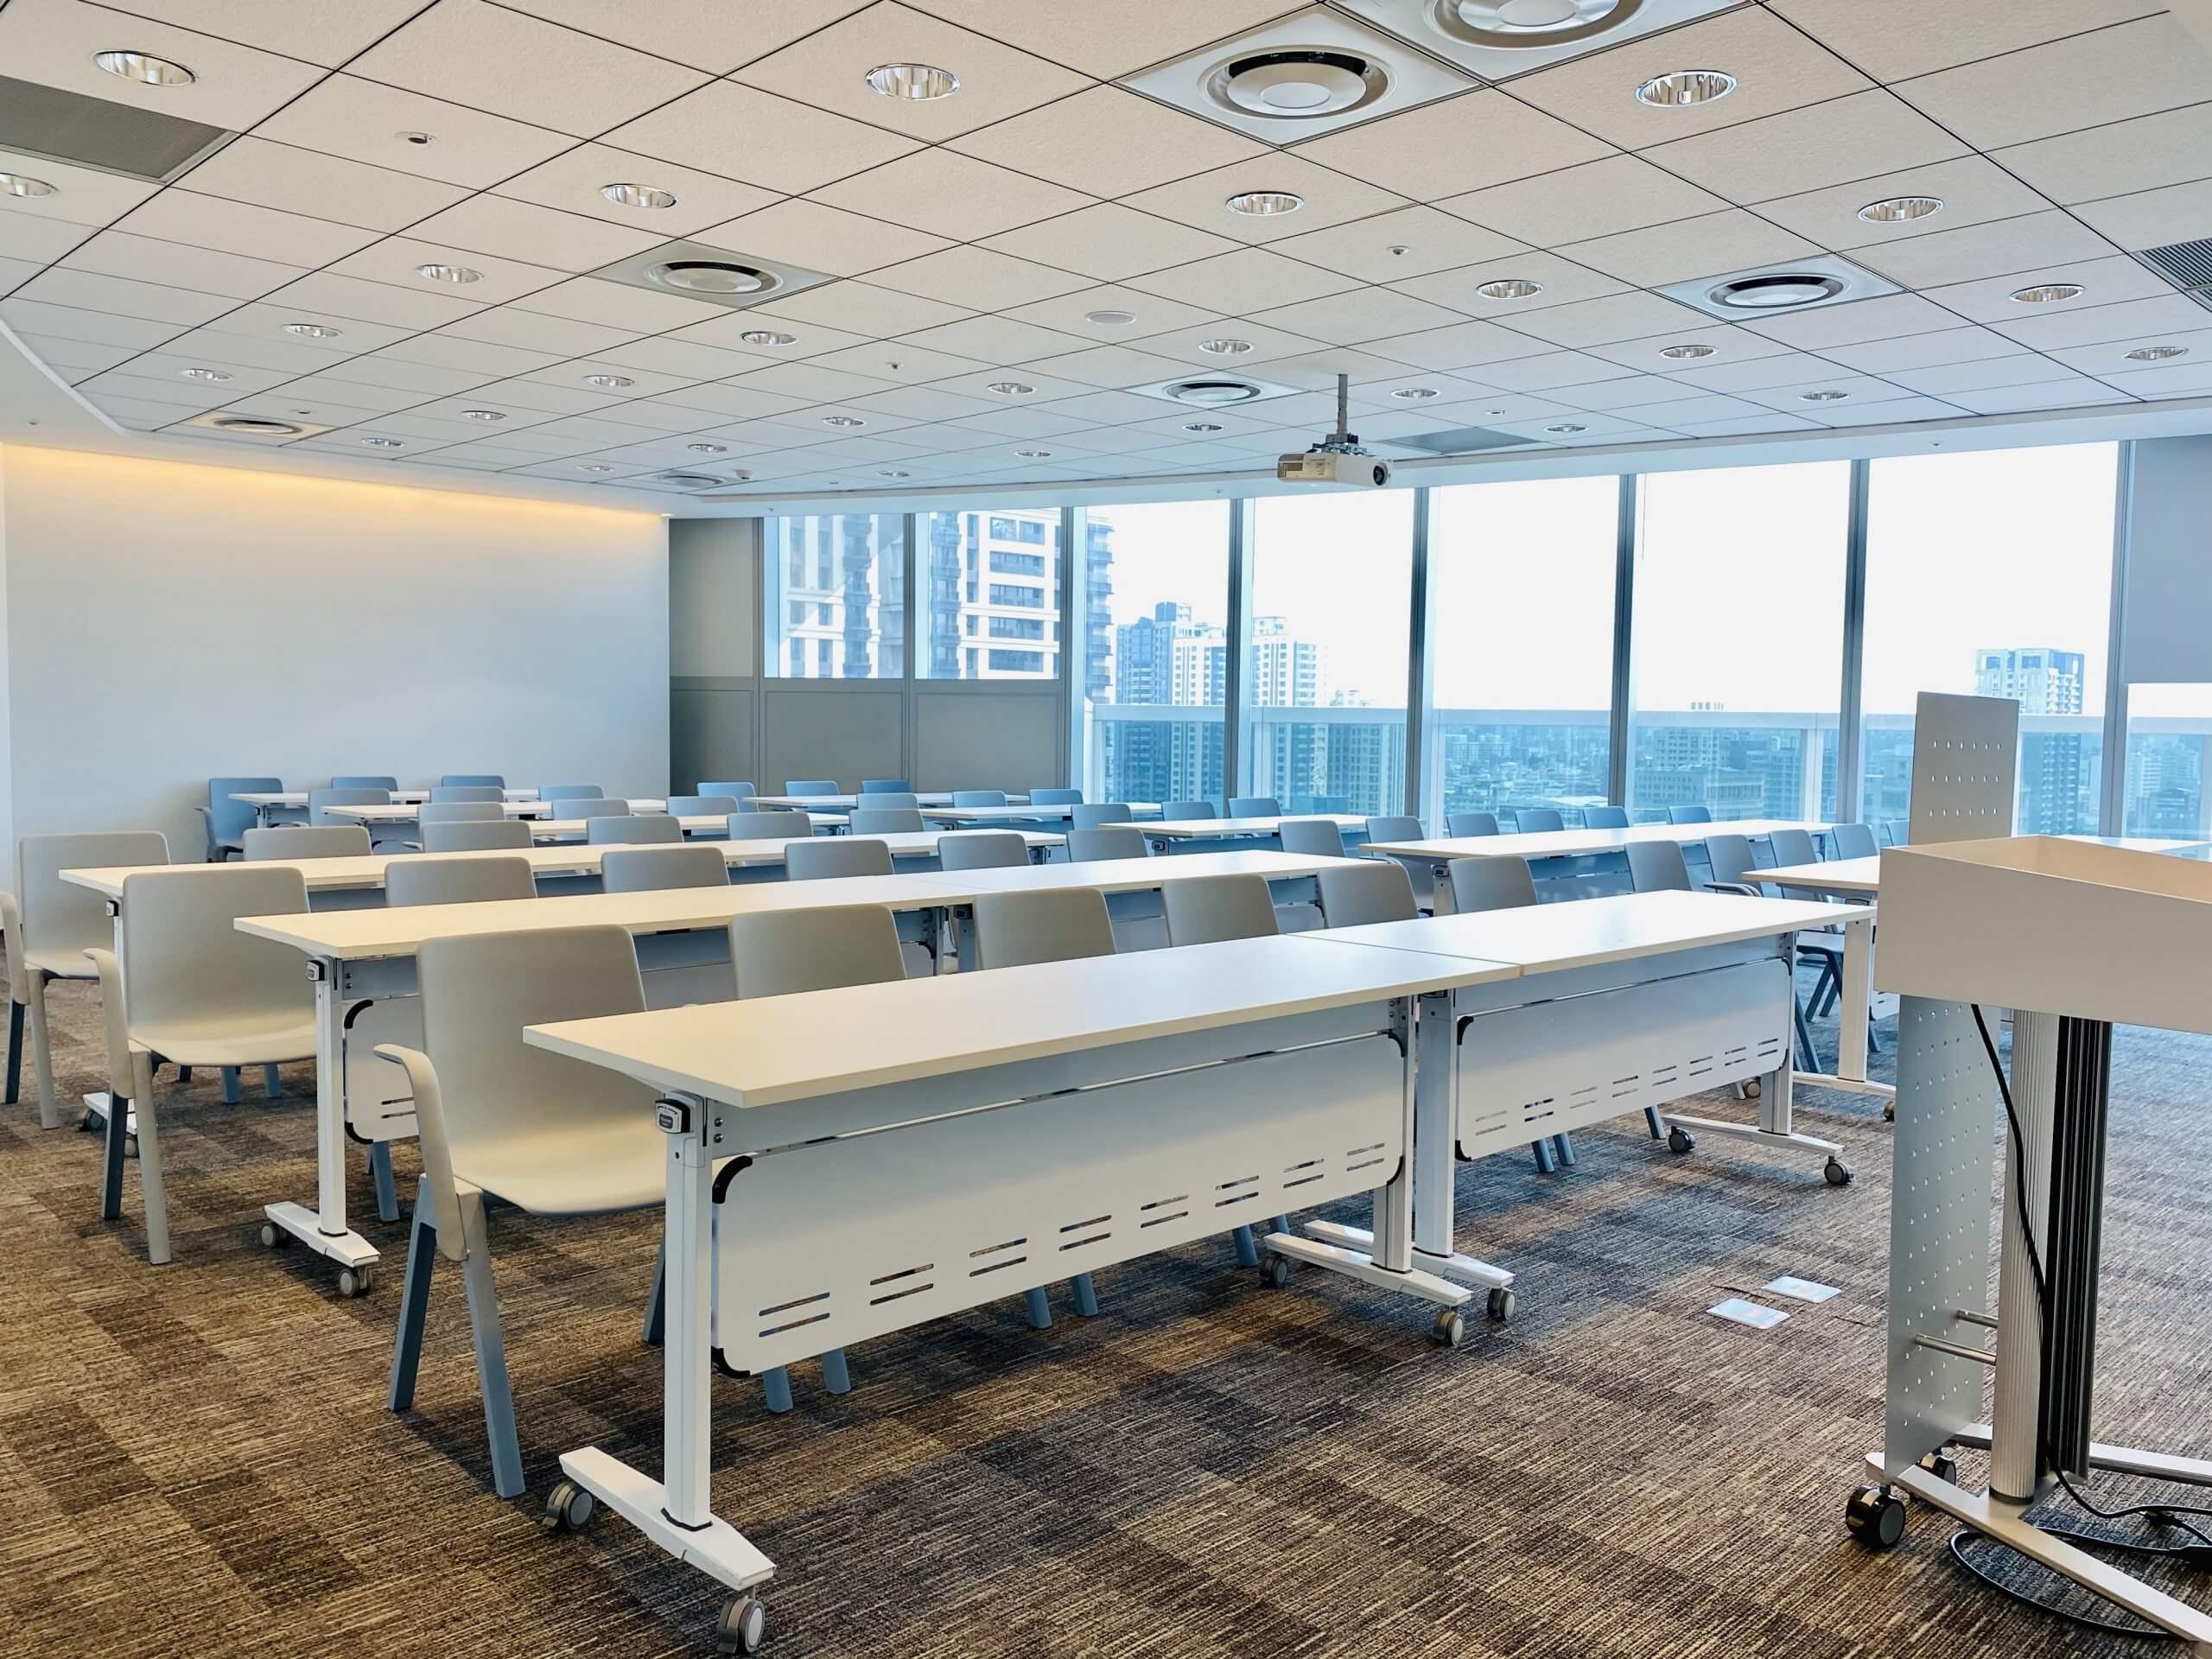 教室型會議室